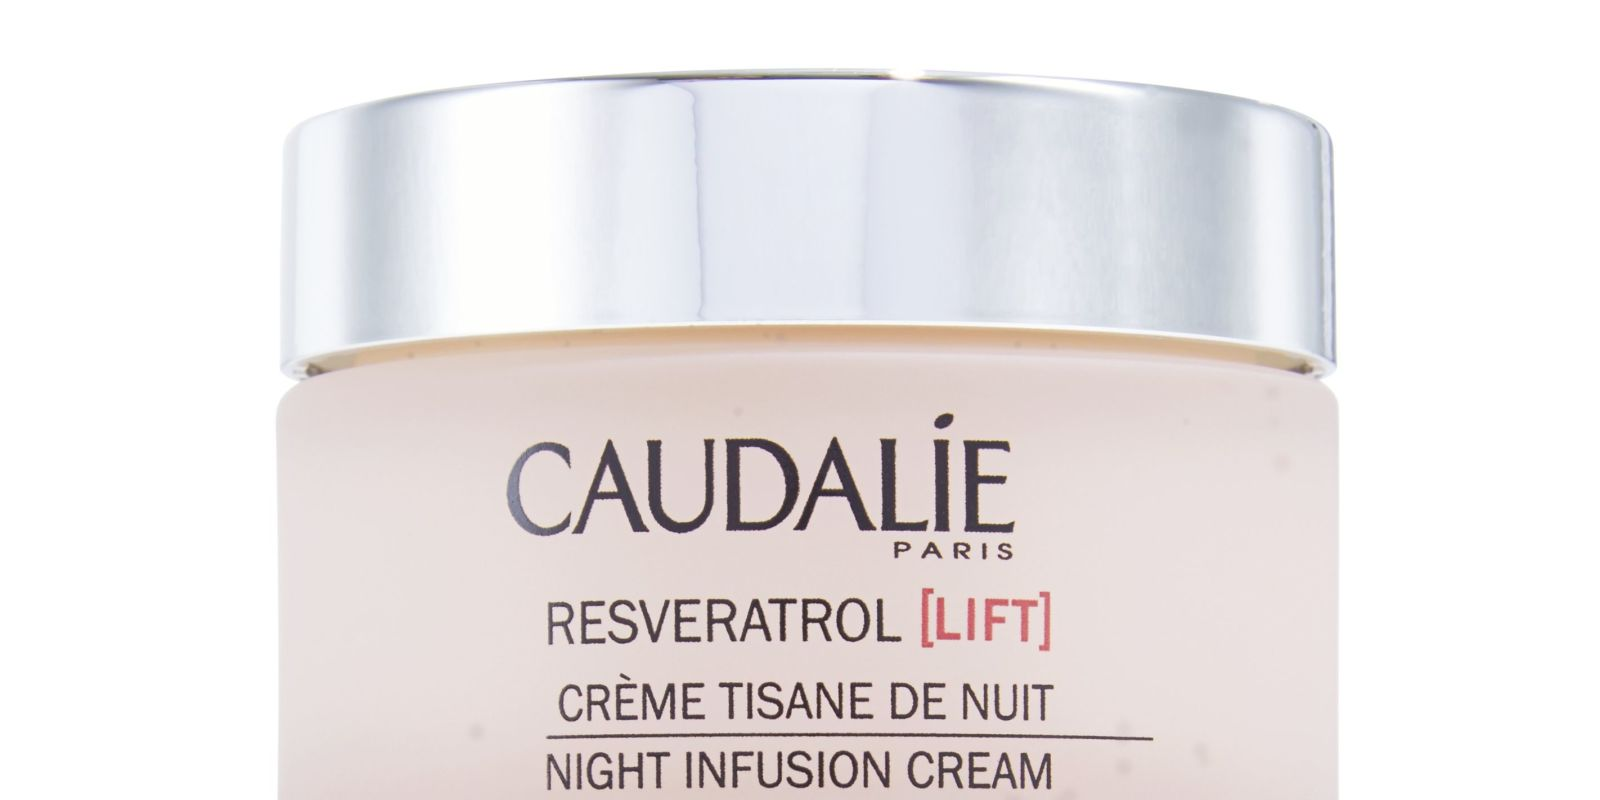 caudalie resveratrol lift night infusion cream review. Black Bedroom Furniture Sets. Home Design Ideas